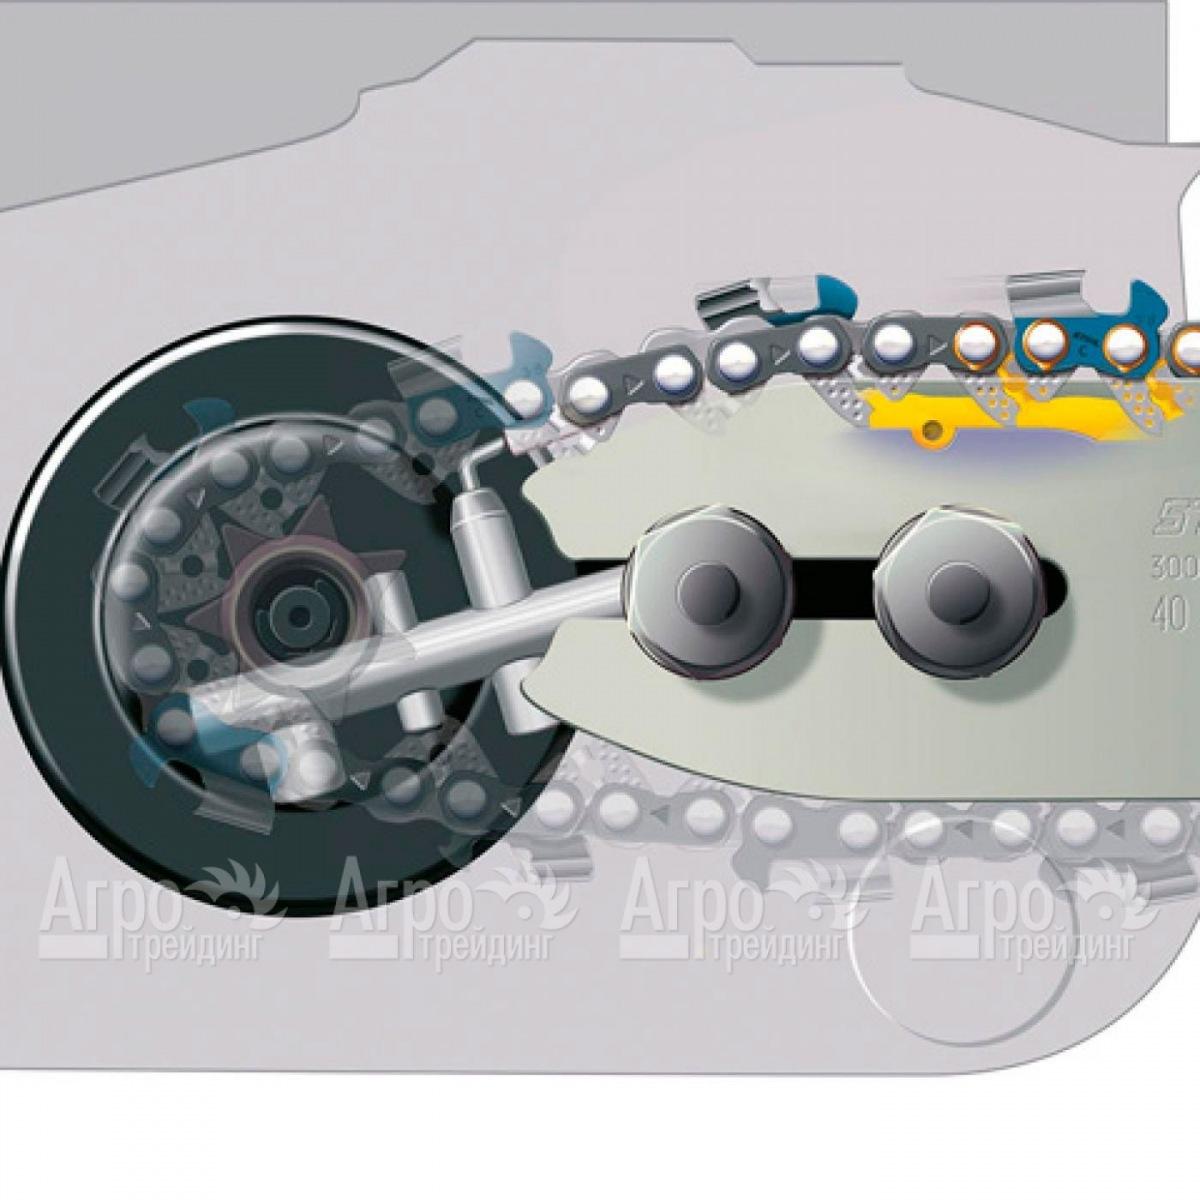 Схема смазки цепи штиль 180